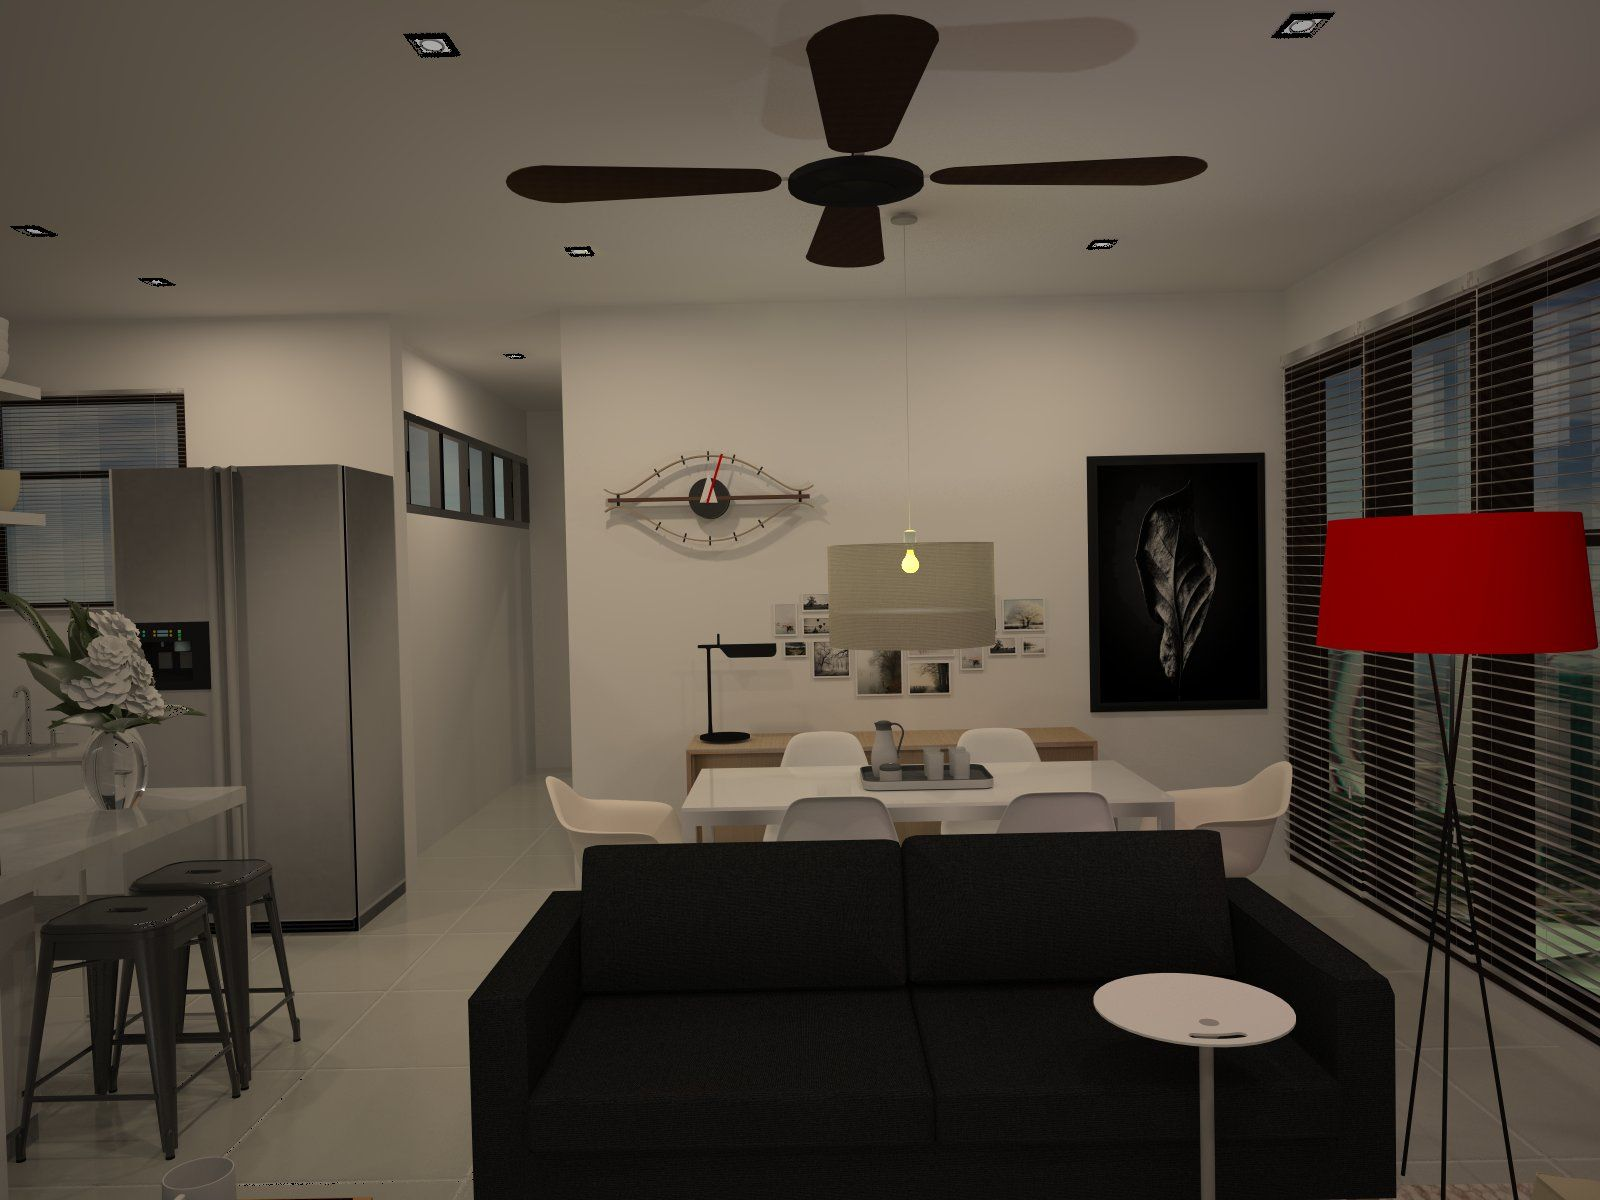 2 Bedroom Apartment In Kl, Malaysia, Setia Sky Residences